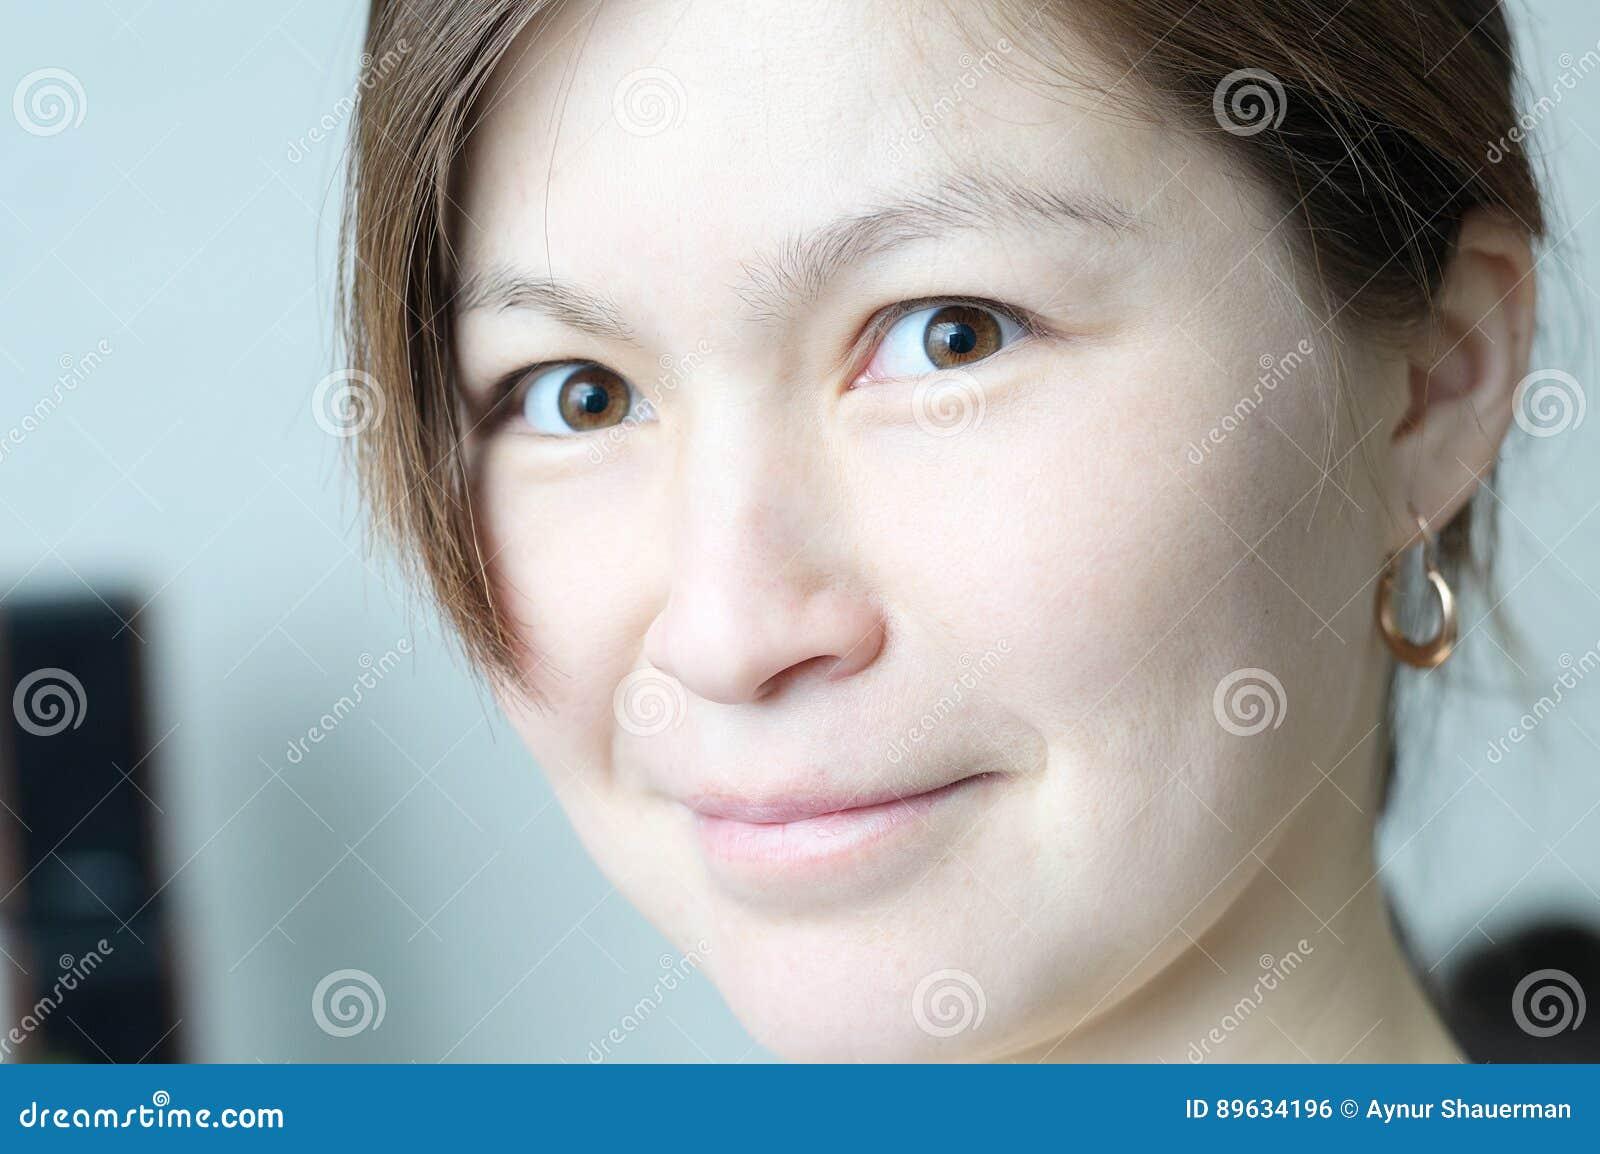 Beautiful Smiling Asian Girl Face Portrait Elegant And